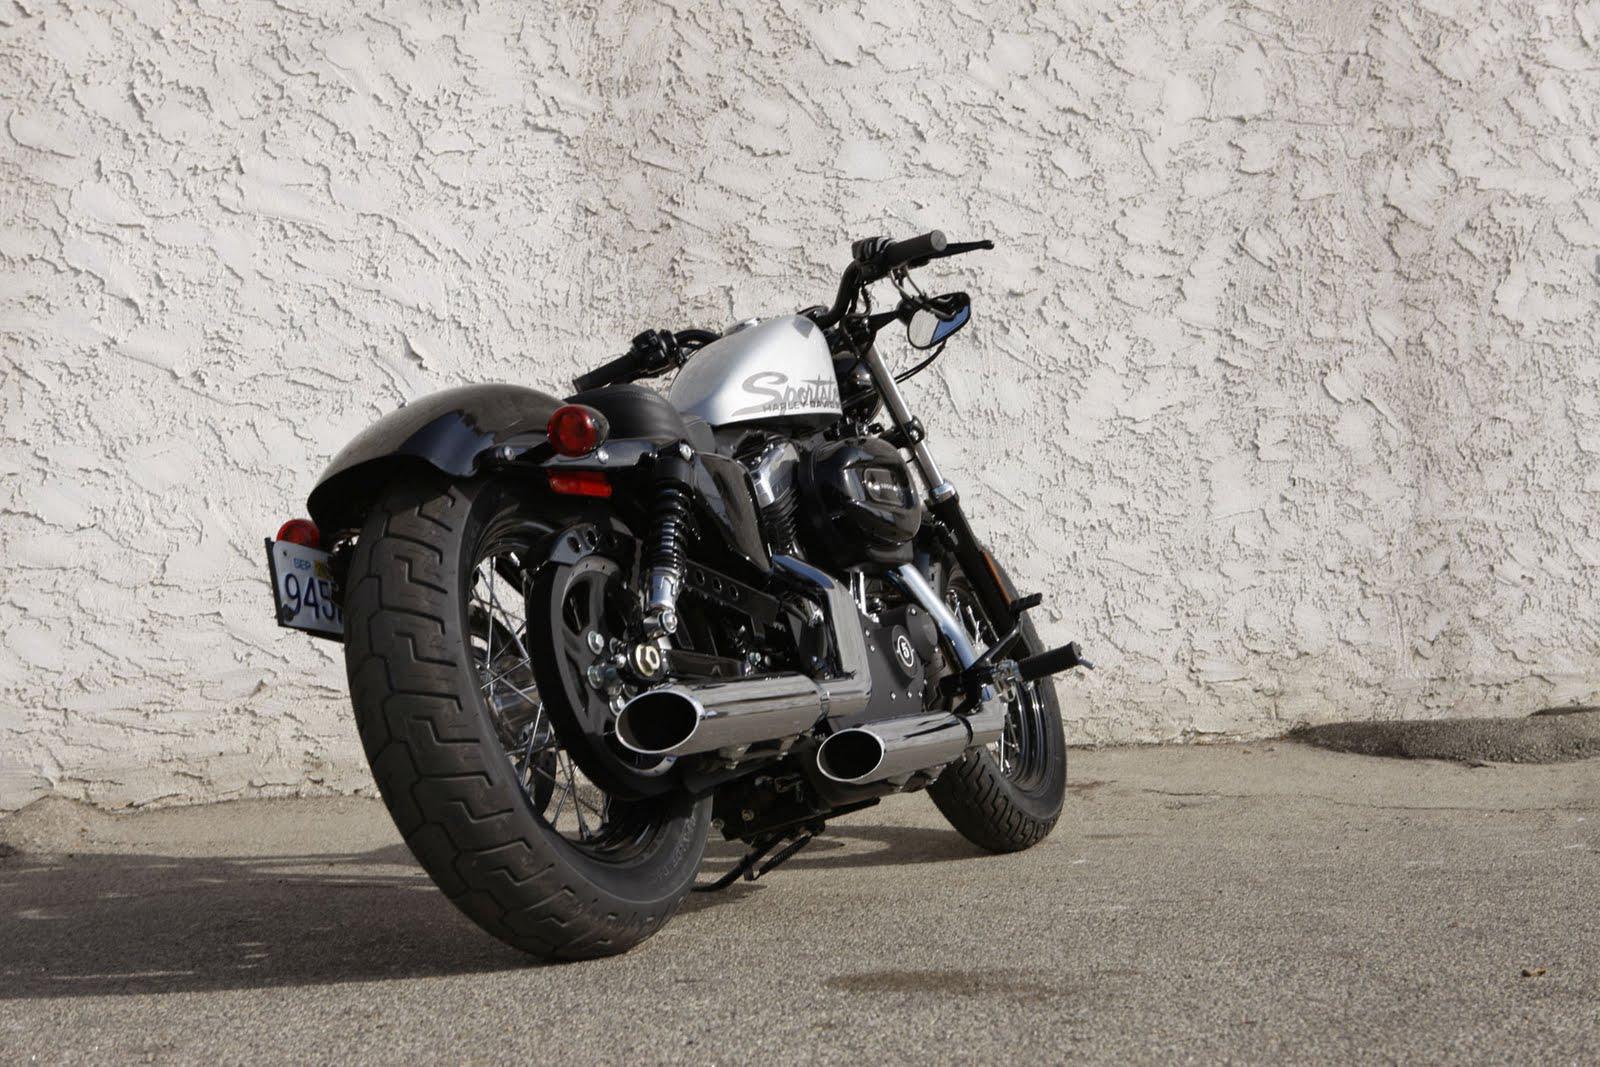 http://3.bp.blogspot.com/-N73EO8BVSSw/TaV7yGFMMhI/AAAAAAAAAGQ/5snA9UUX3_c/s1600/2010-Harley-Davidson-Sportster-Forty-Eight-Rear-View.jpg